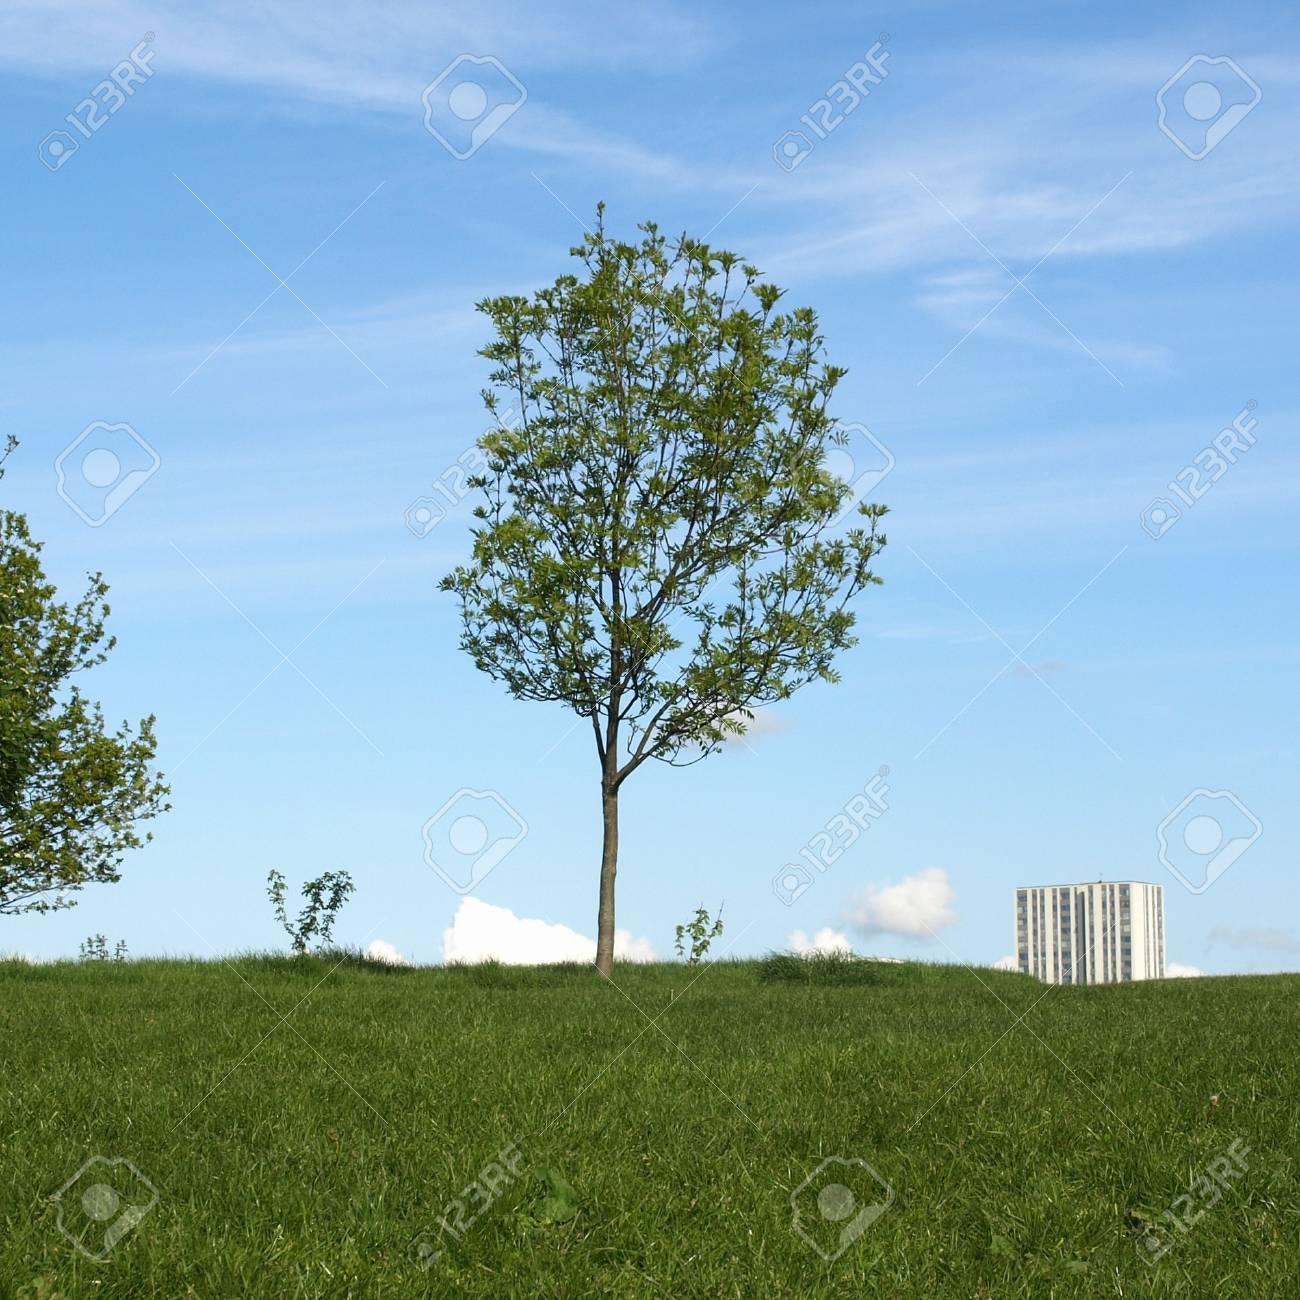 Primrose Hill park in London, England, UK Stock Photo - 7236134